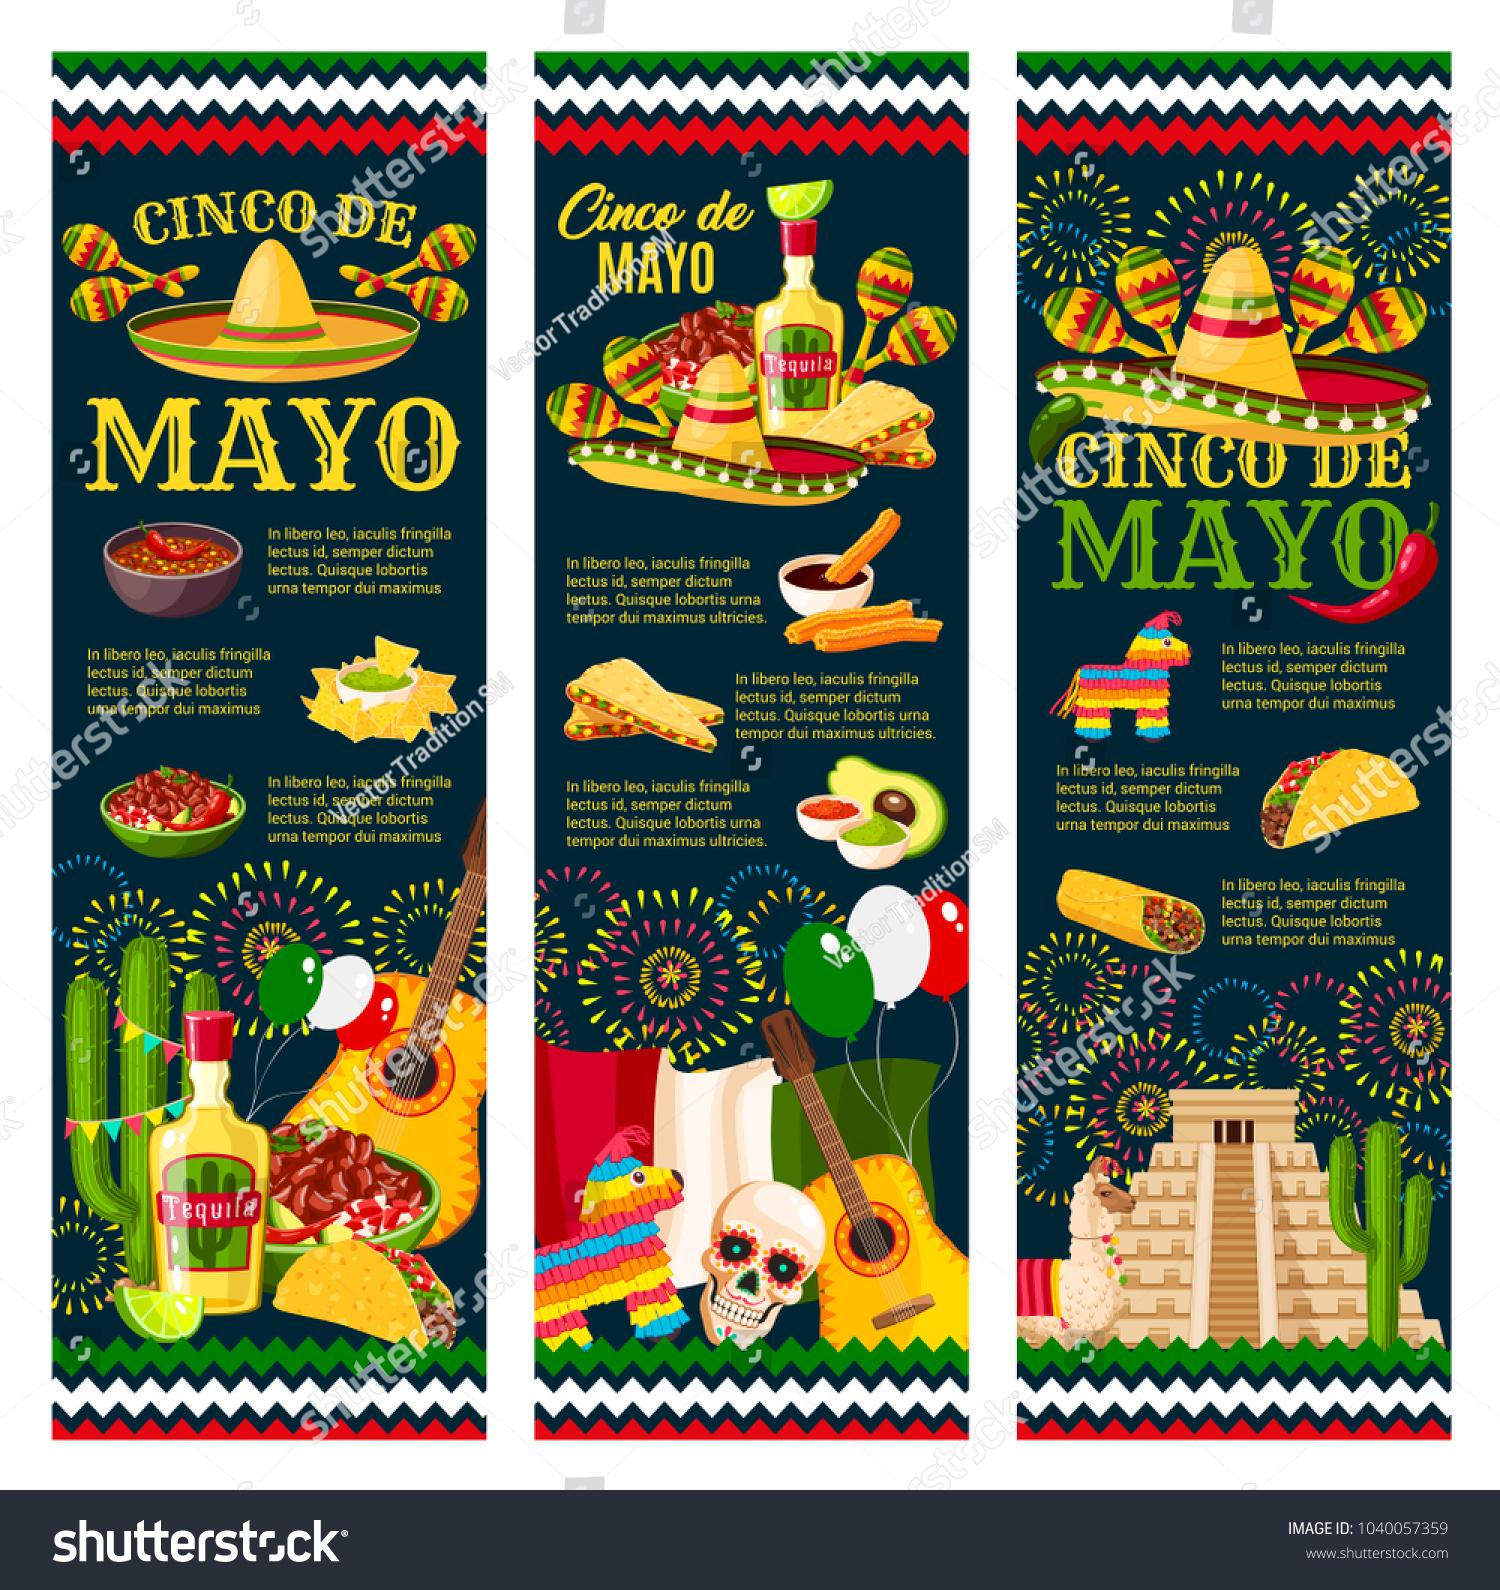 Cinco de mayo festival greeting banner stock vector 1040057359 cinco de mayo festival greeting banner for mexican holiday celebration design latin american fiesta party kristyandbryce Gallery